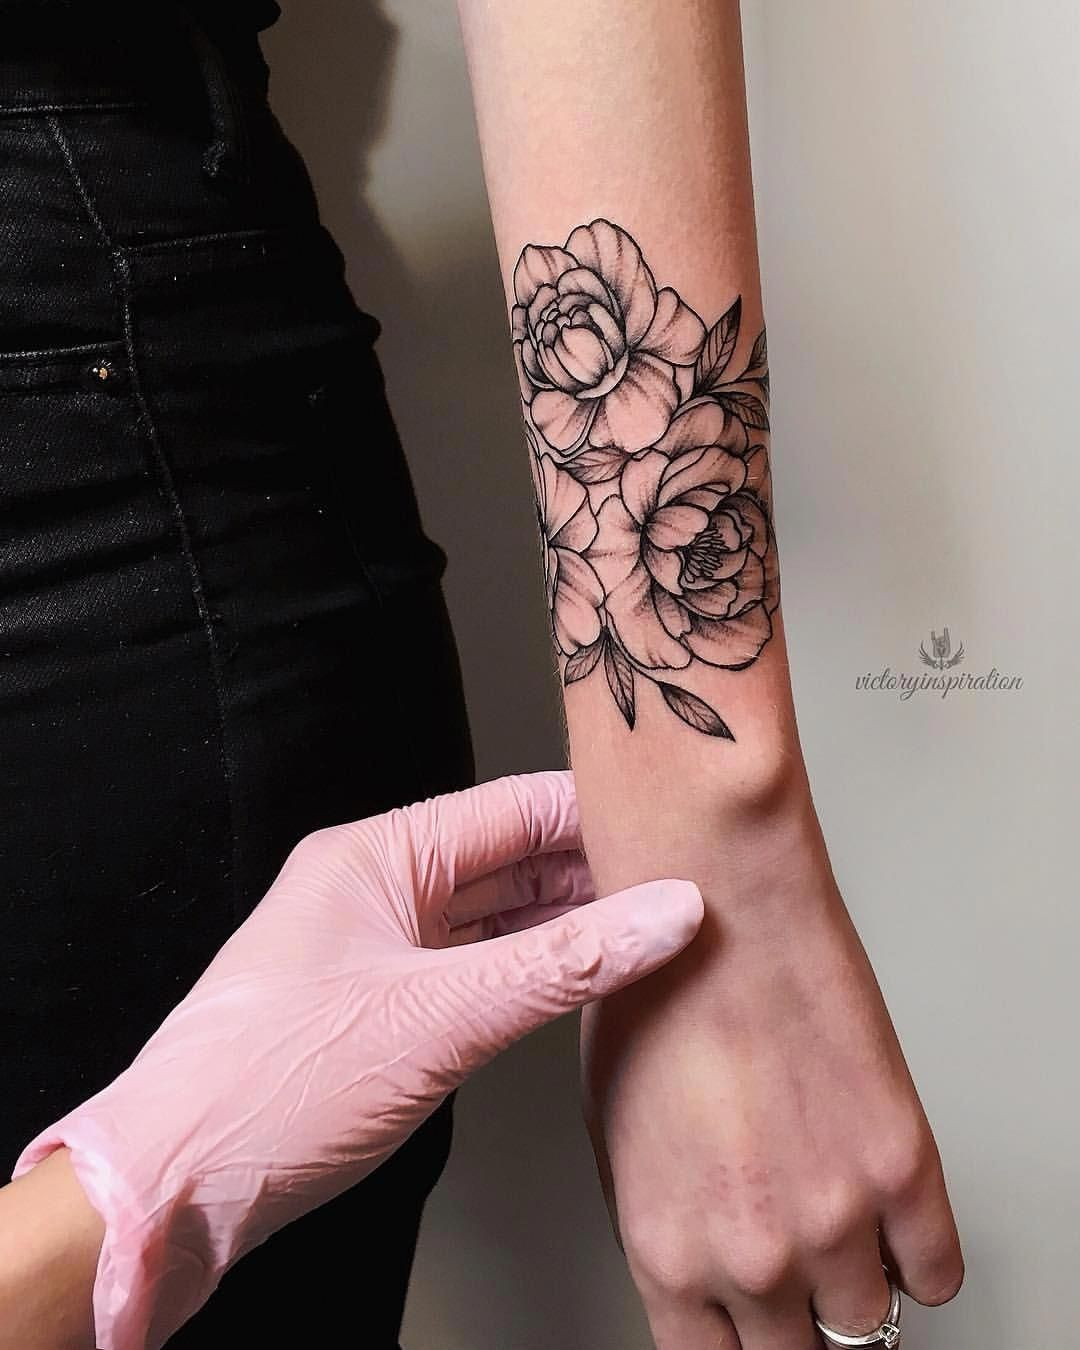 Flower Tattoo For Your Wrist Forearm Flower Tattoo Small Forearm Tattoos Tattoos